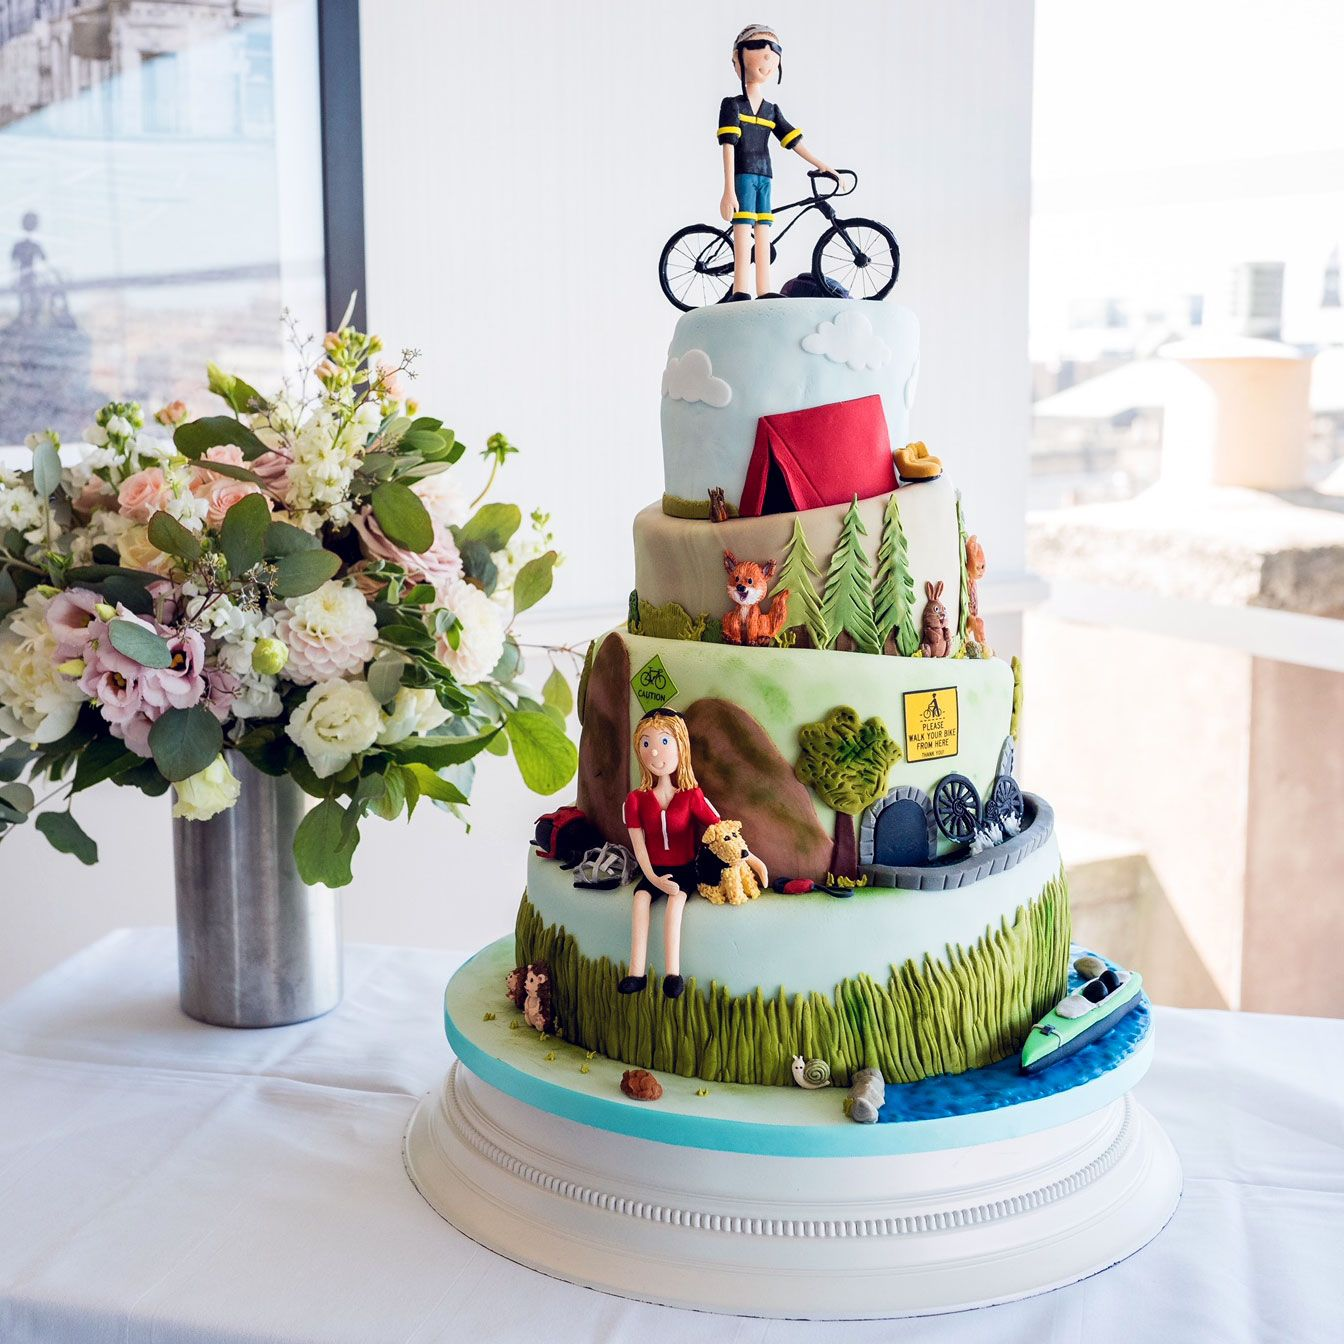 Google Image Result For Https W Rainbowsugarcraft Co Uk Images Biking Wedding Cake Jpg Novelty Wedding Cakes Wedding Cake Supplies Cake Decorating